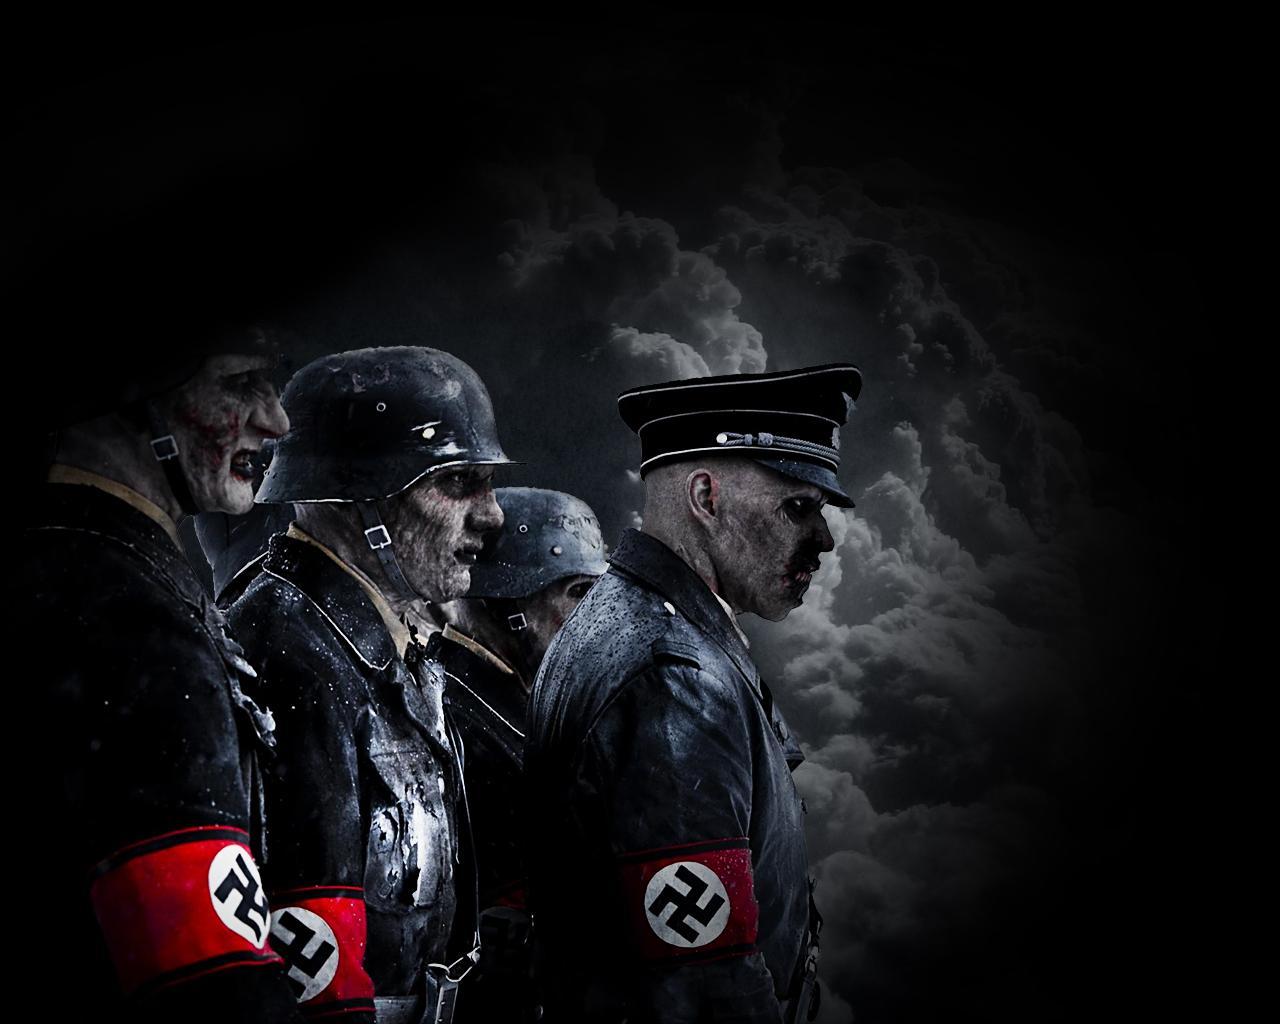 Nazi Horrorfilm